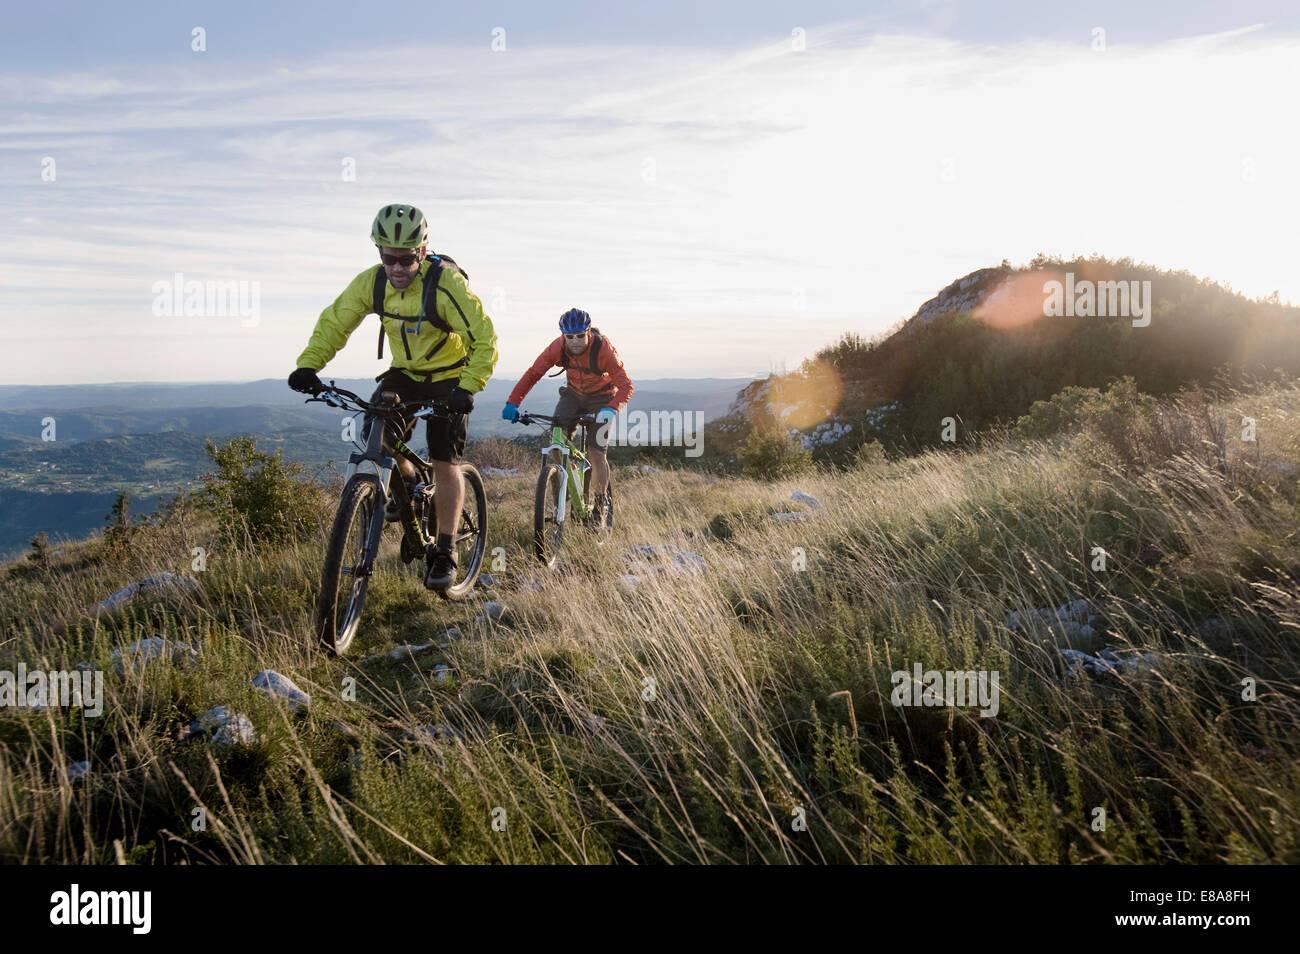 zwei Mountainbiker auf dem Weg bergab, Vipava-Tal, Istrien, Slowenien Stockbild